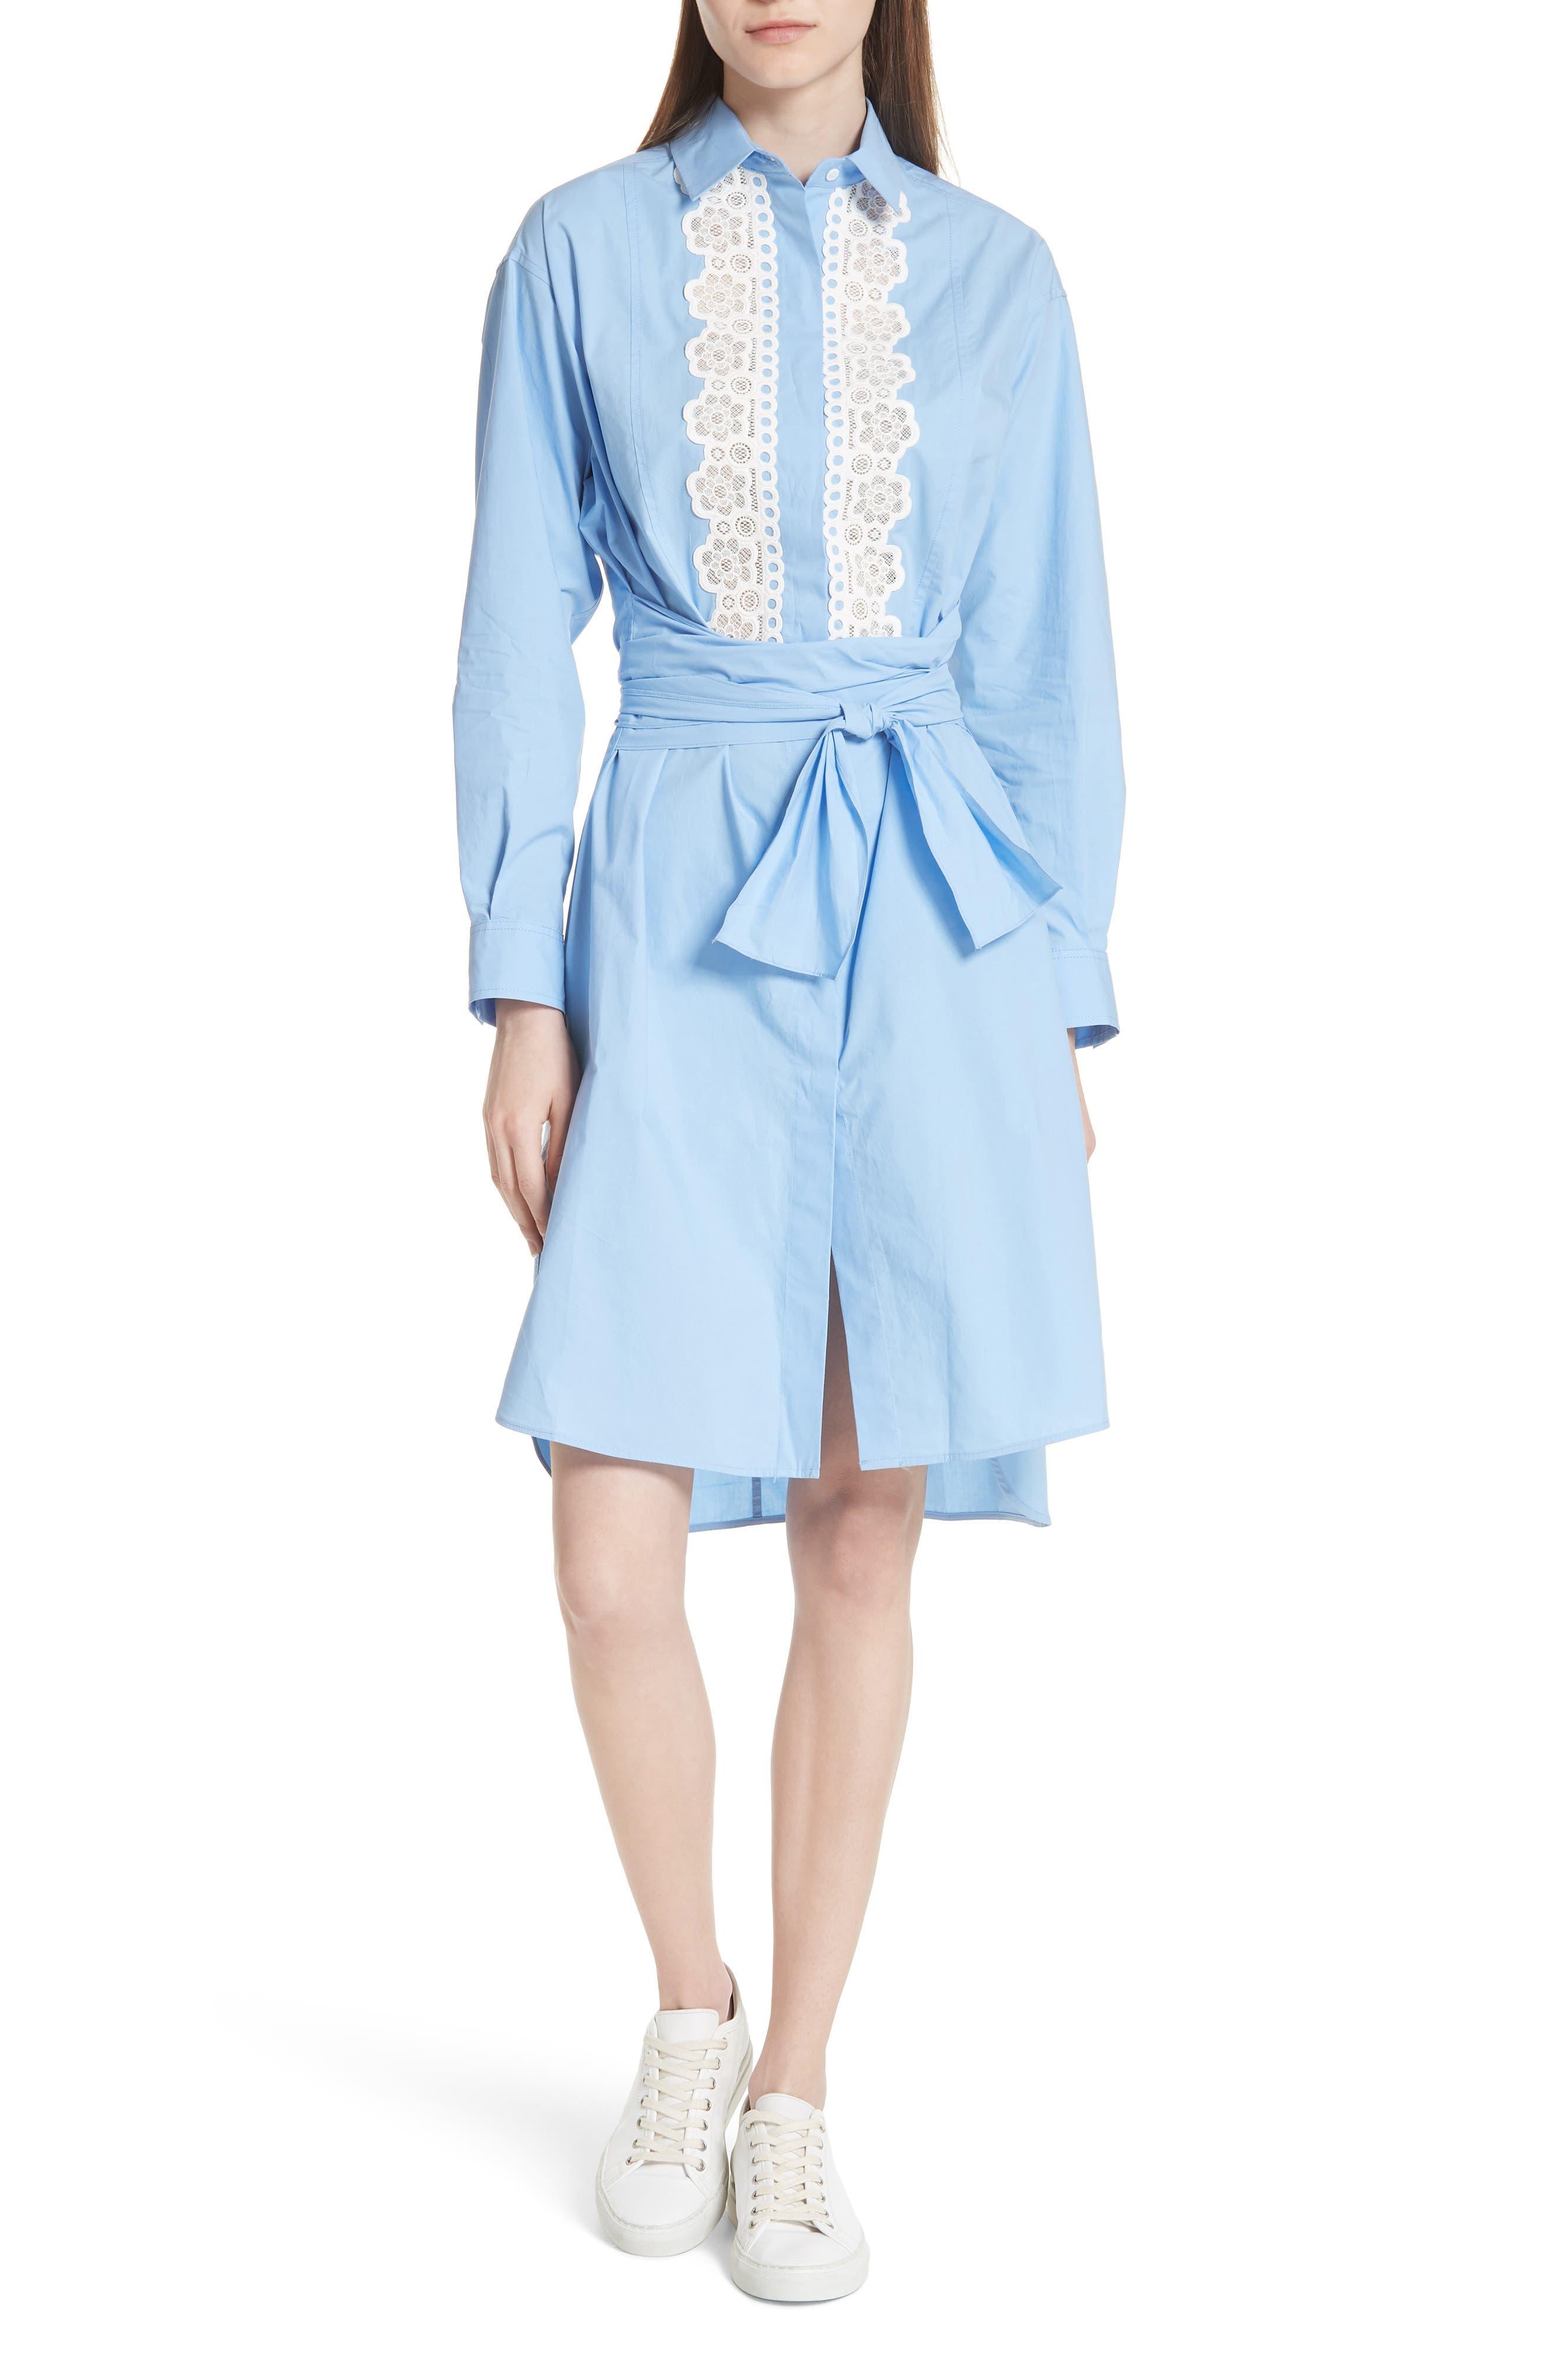 Alternate Image 1 Selected - sandro Bleu Ciel Cotton Shirtdress